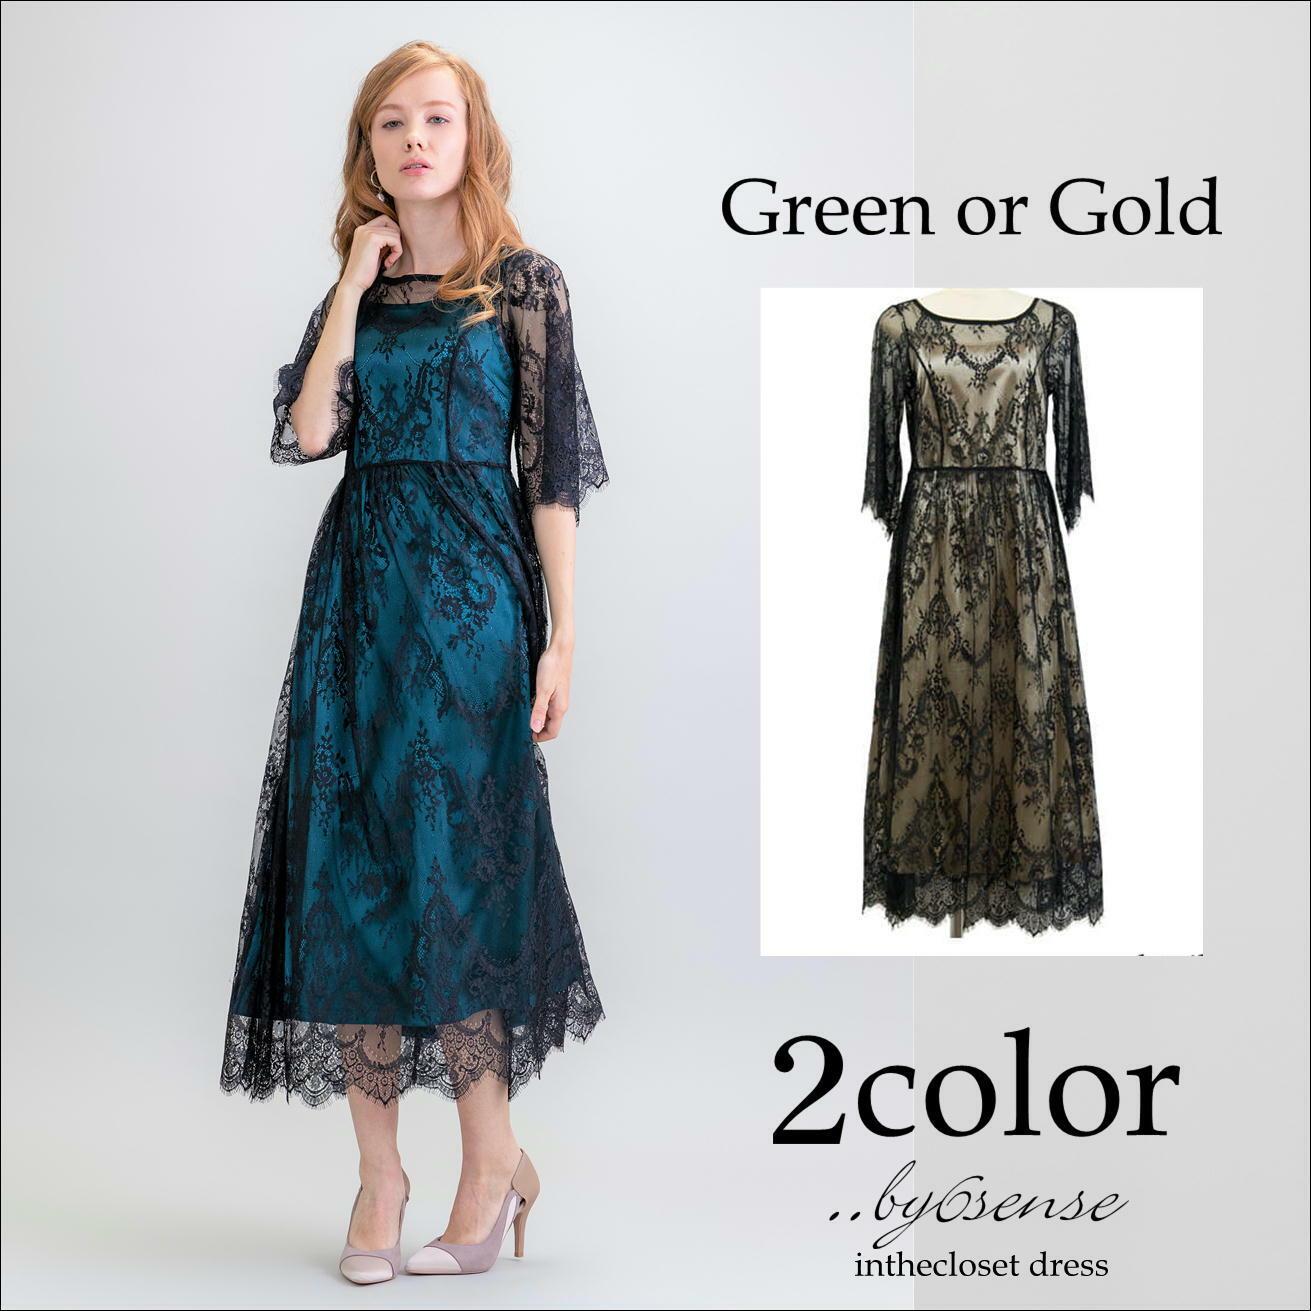 2color総レースinロングキャミソールワンピースドレス